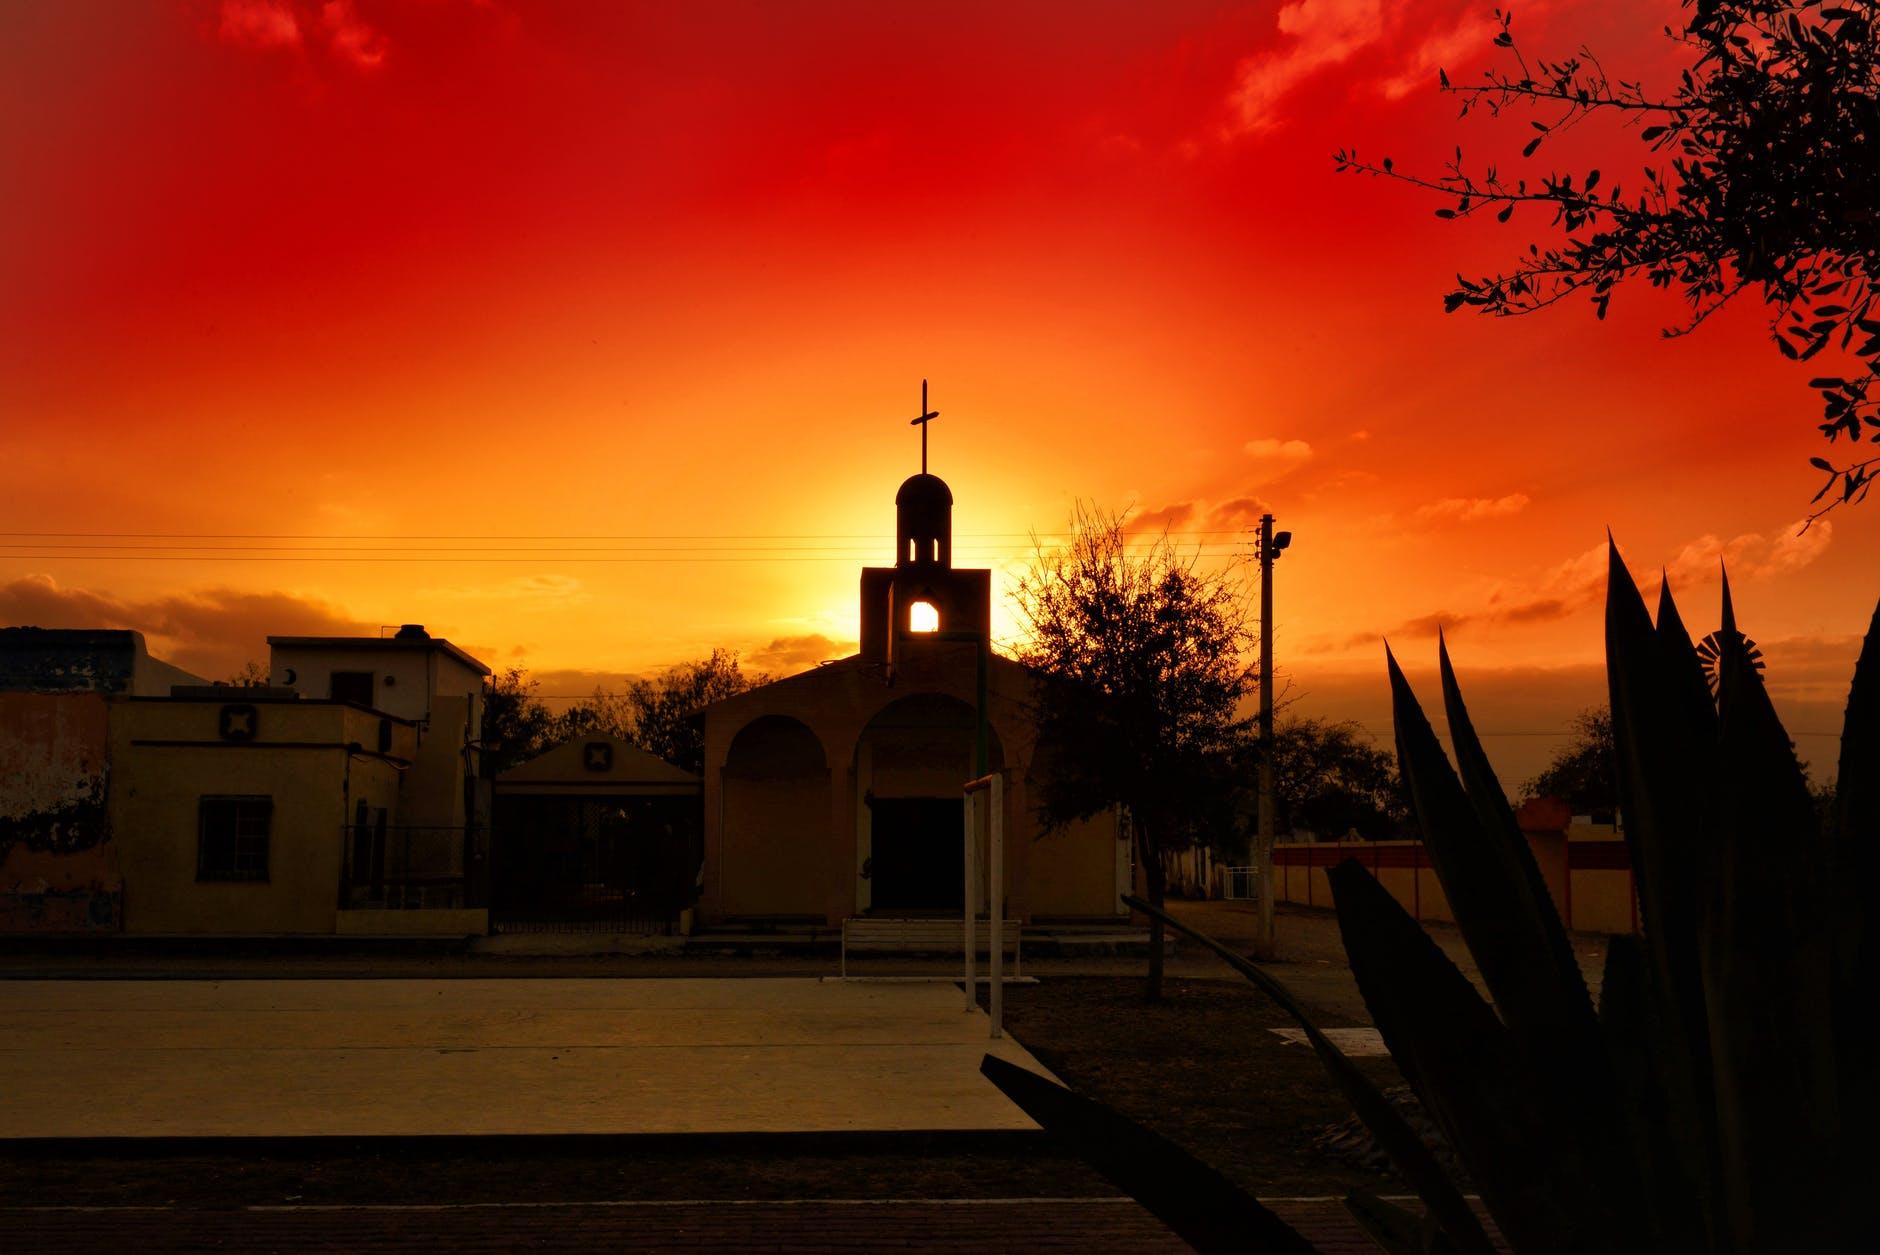 architecture building catholic church